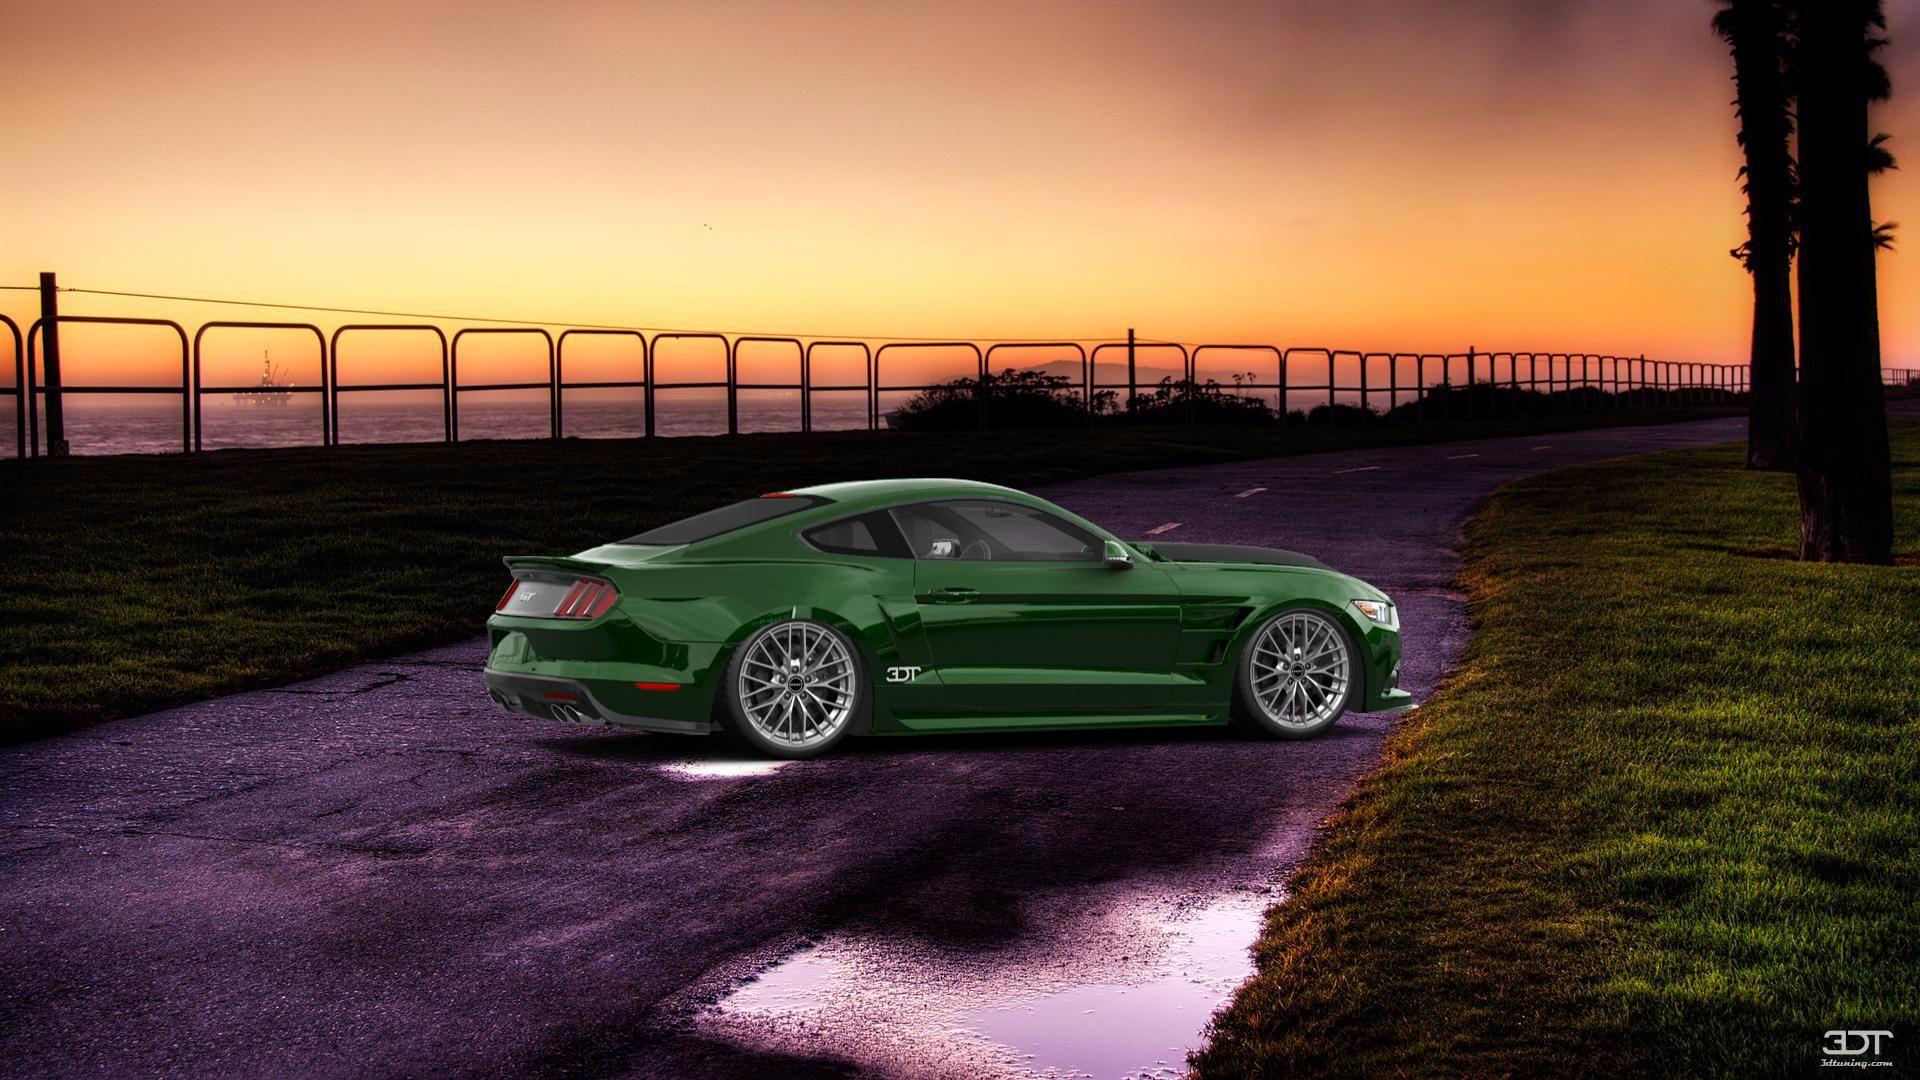 Checkout my tuning #Mustang #GT 2115 at 3DTuning #3dtuning